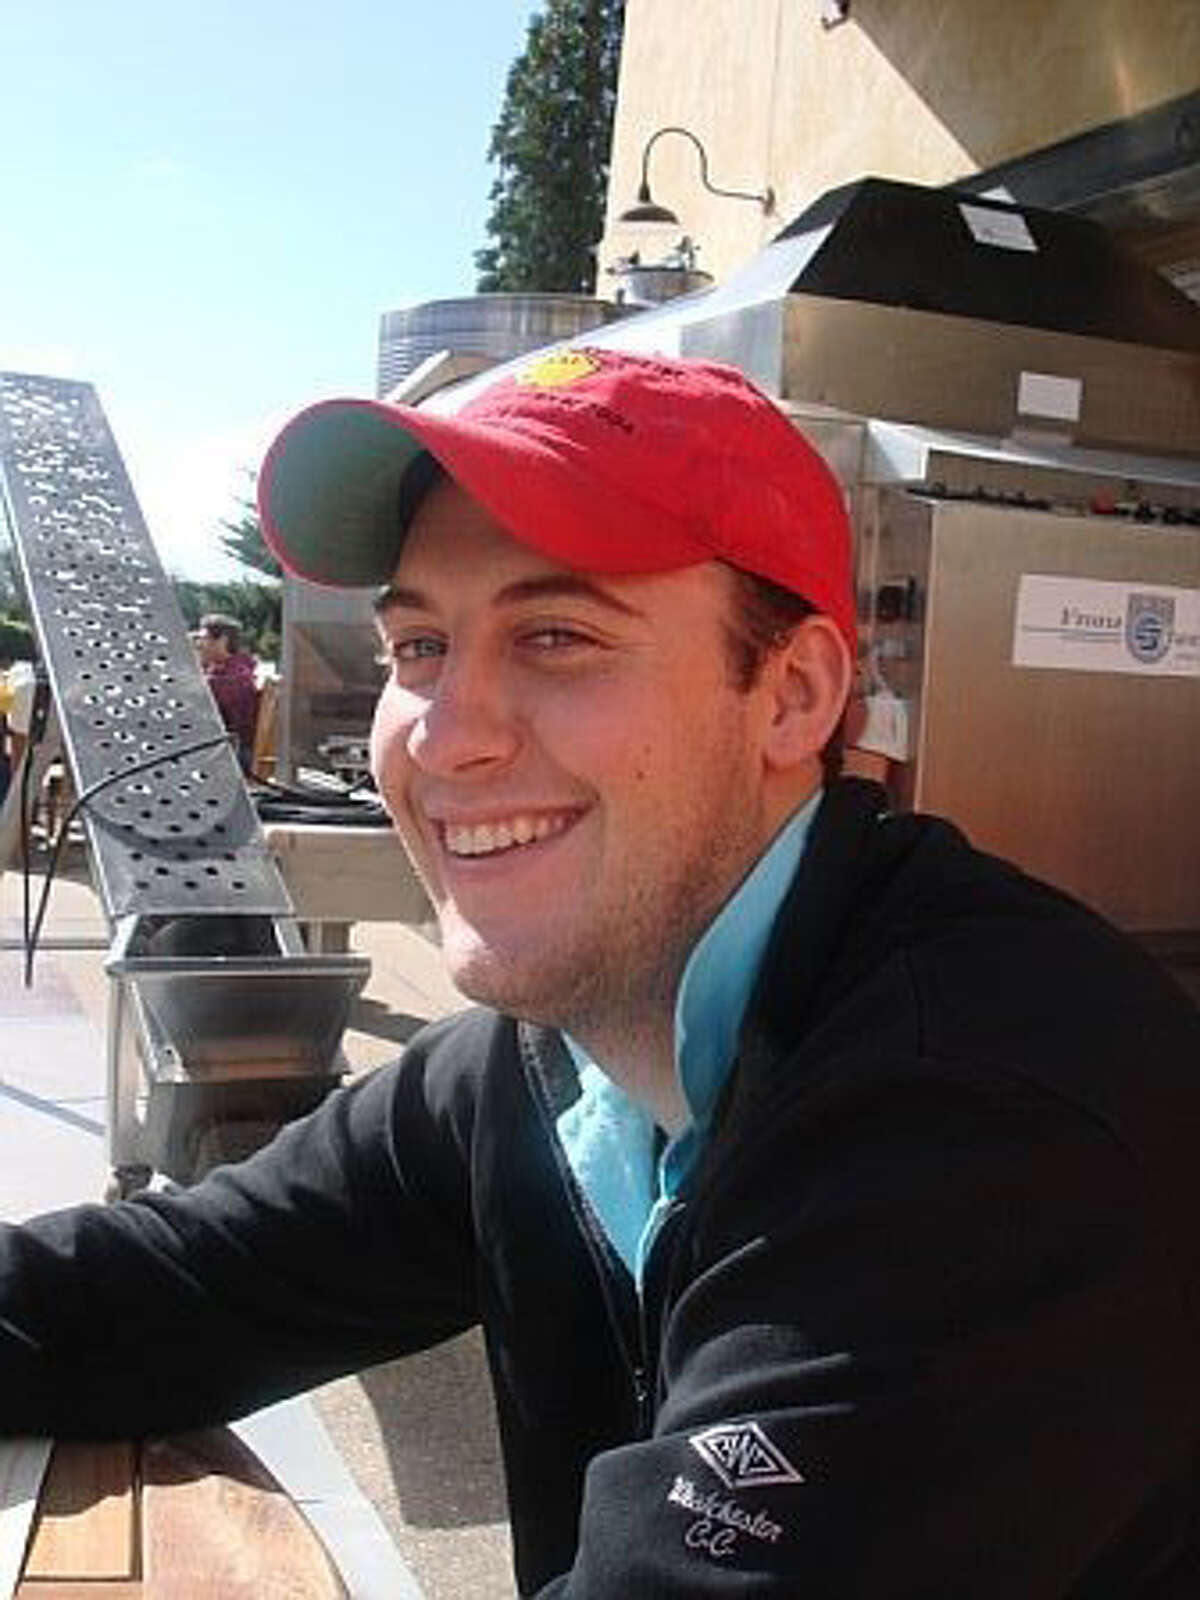 Stephen Meszkat, 28, of New Canaan died in a car crash Friday night on Ponus Ridge Road.